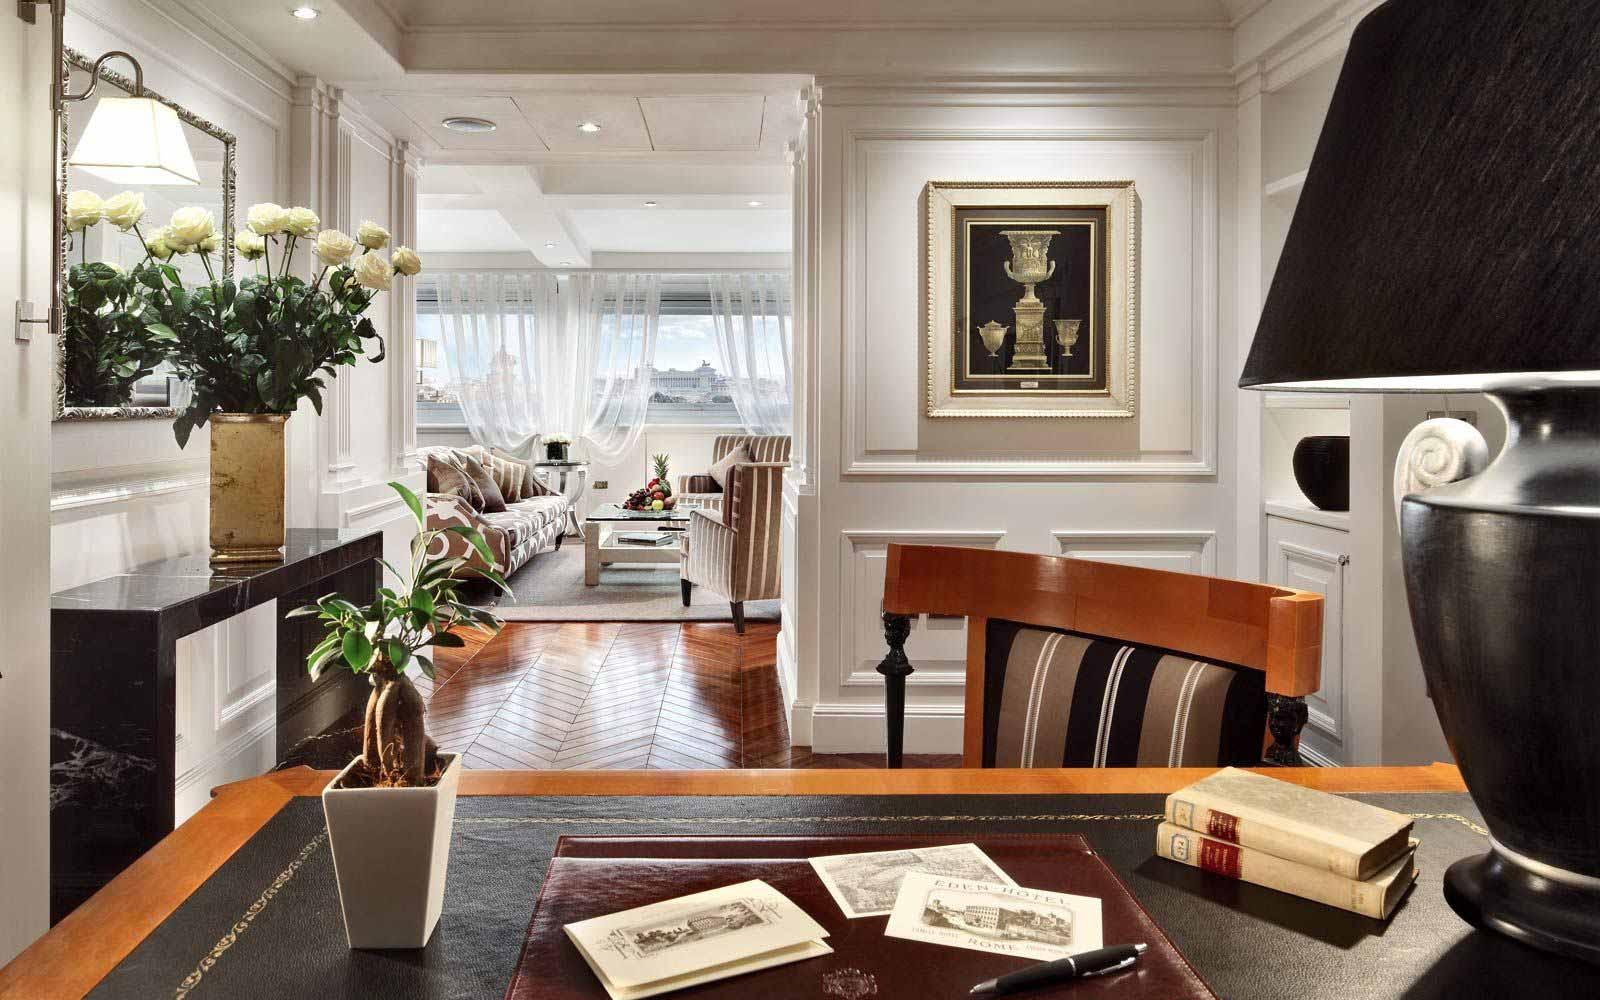 Penthouse suite at Hotel Eden